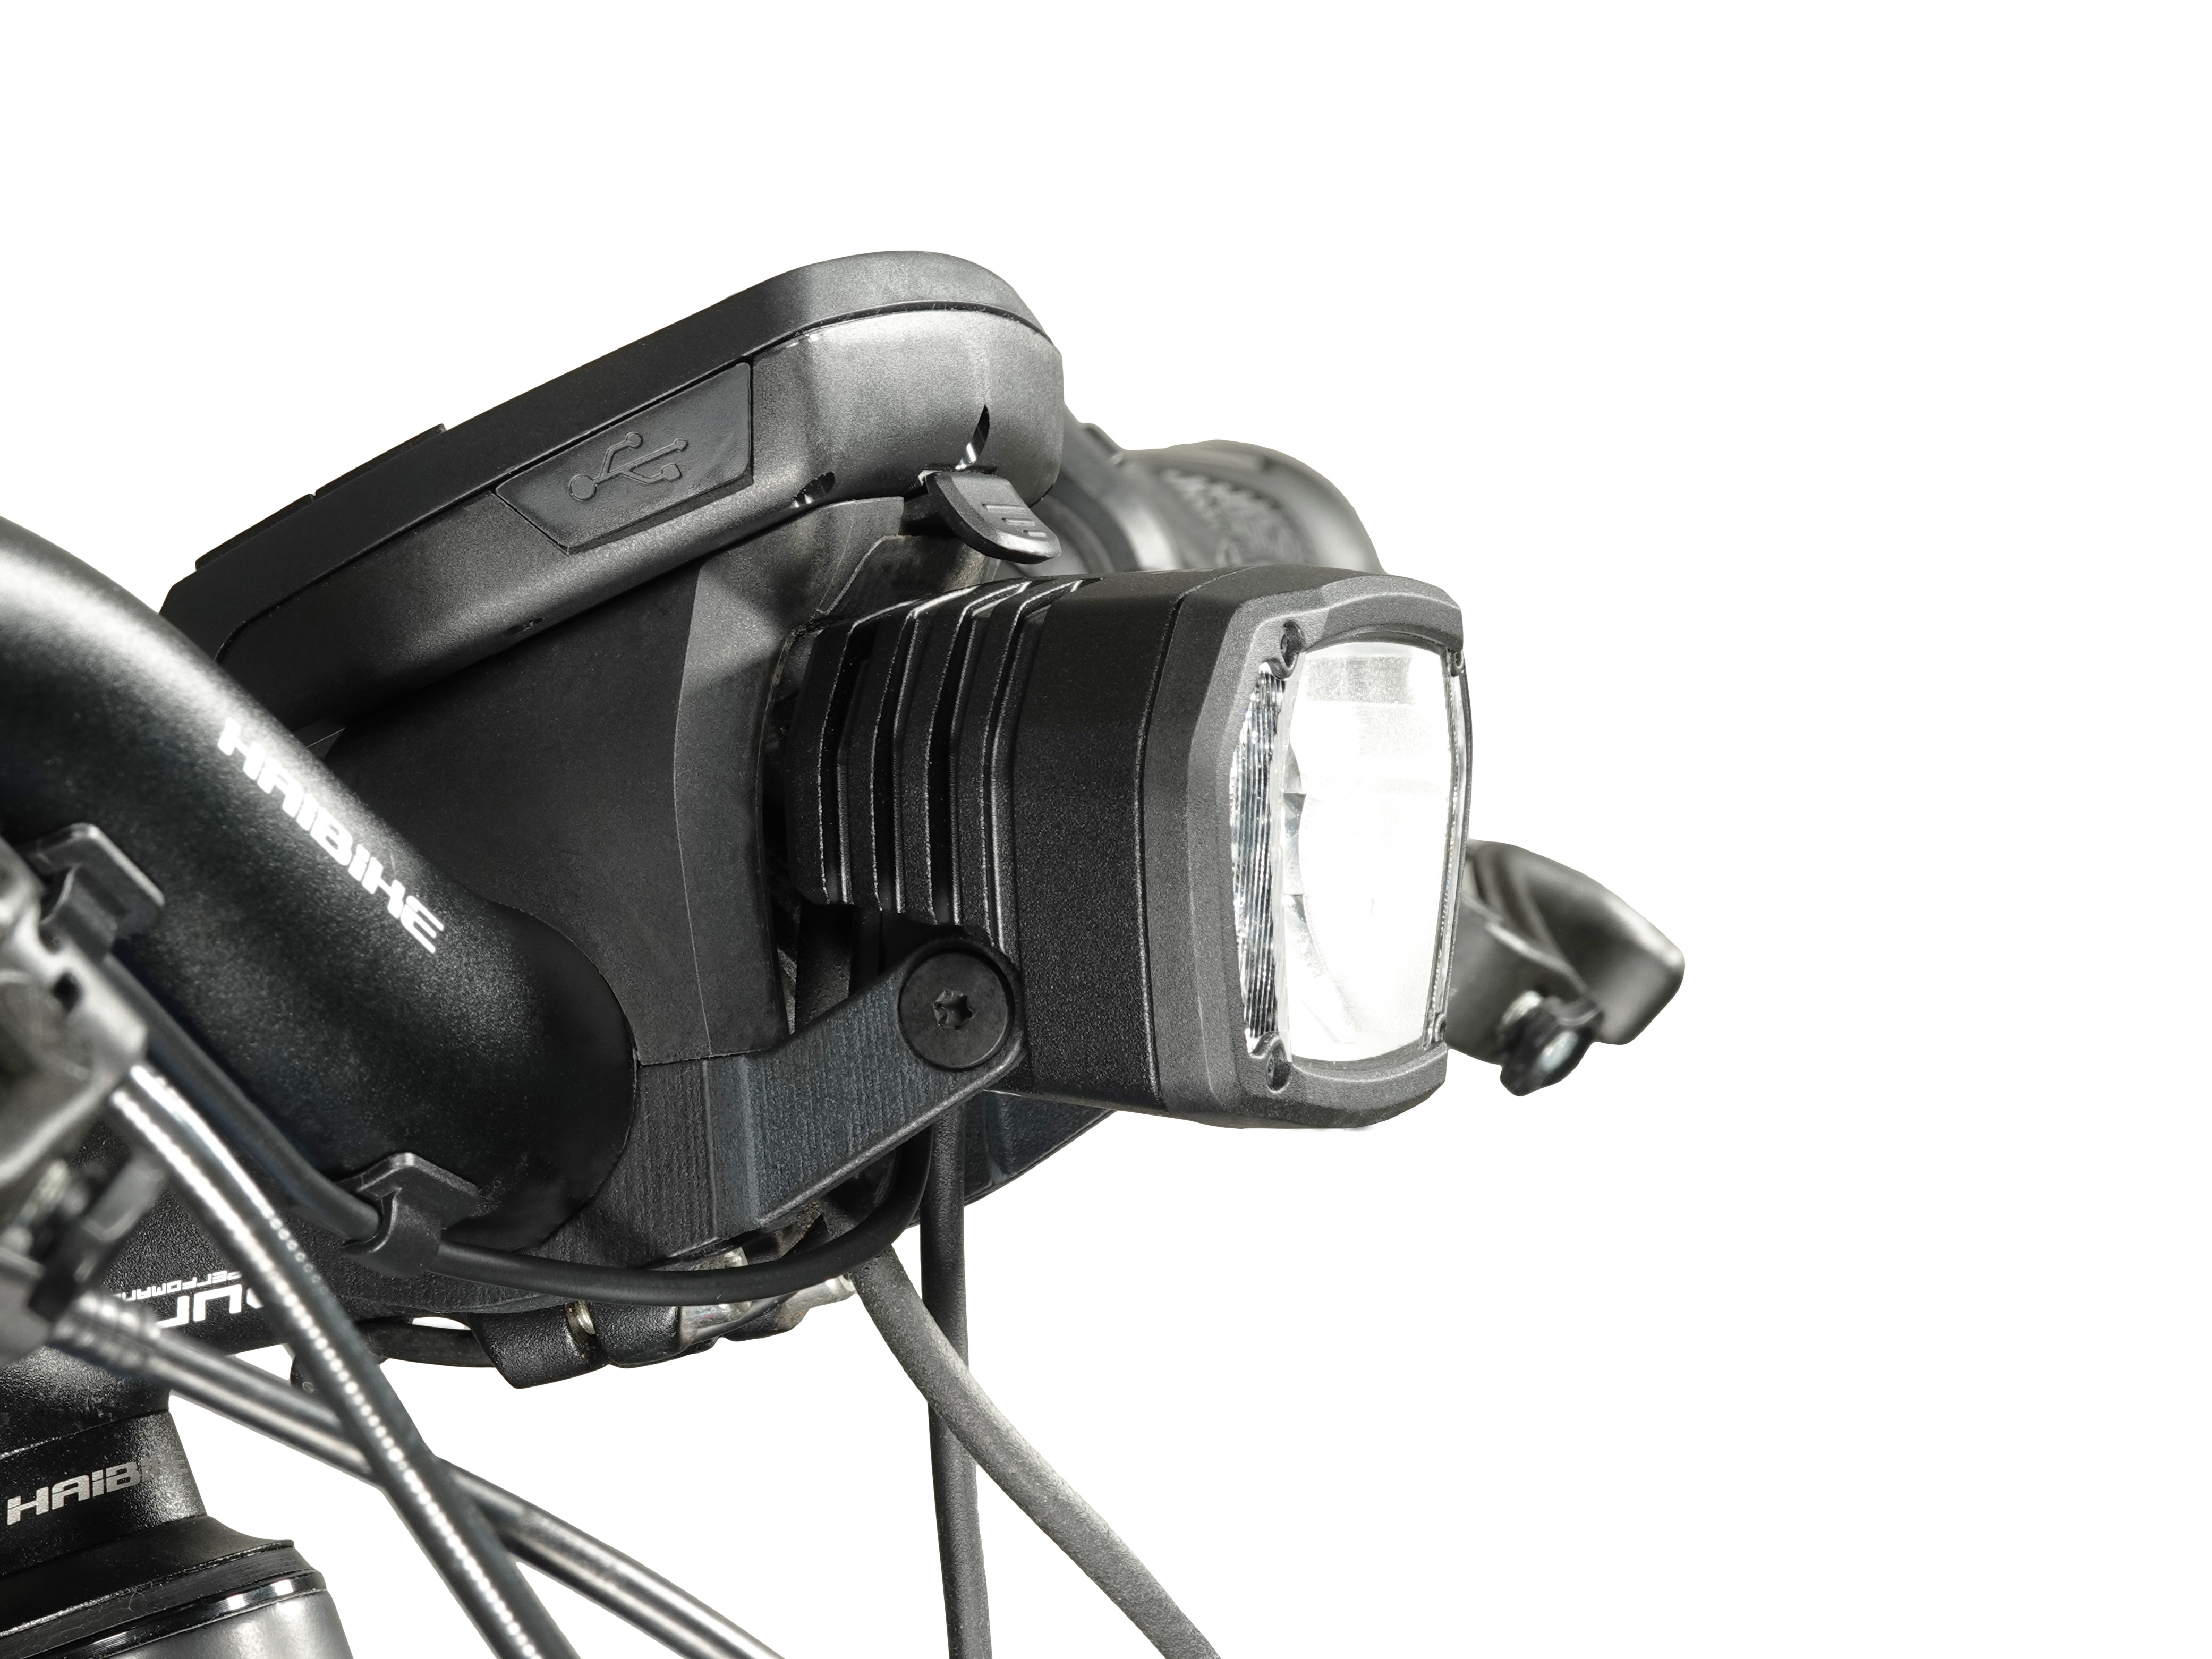 SL X Bosch für Intuvia/Nyon